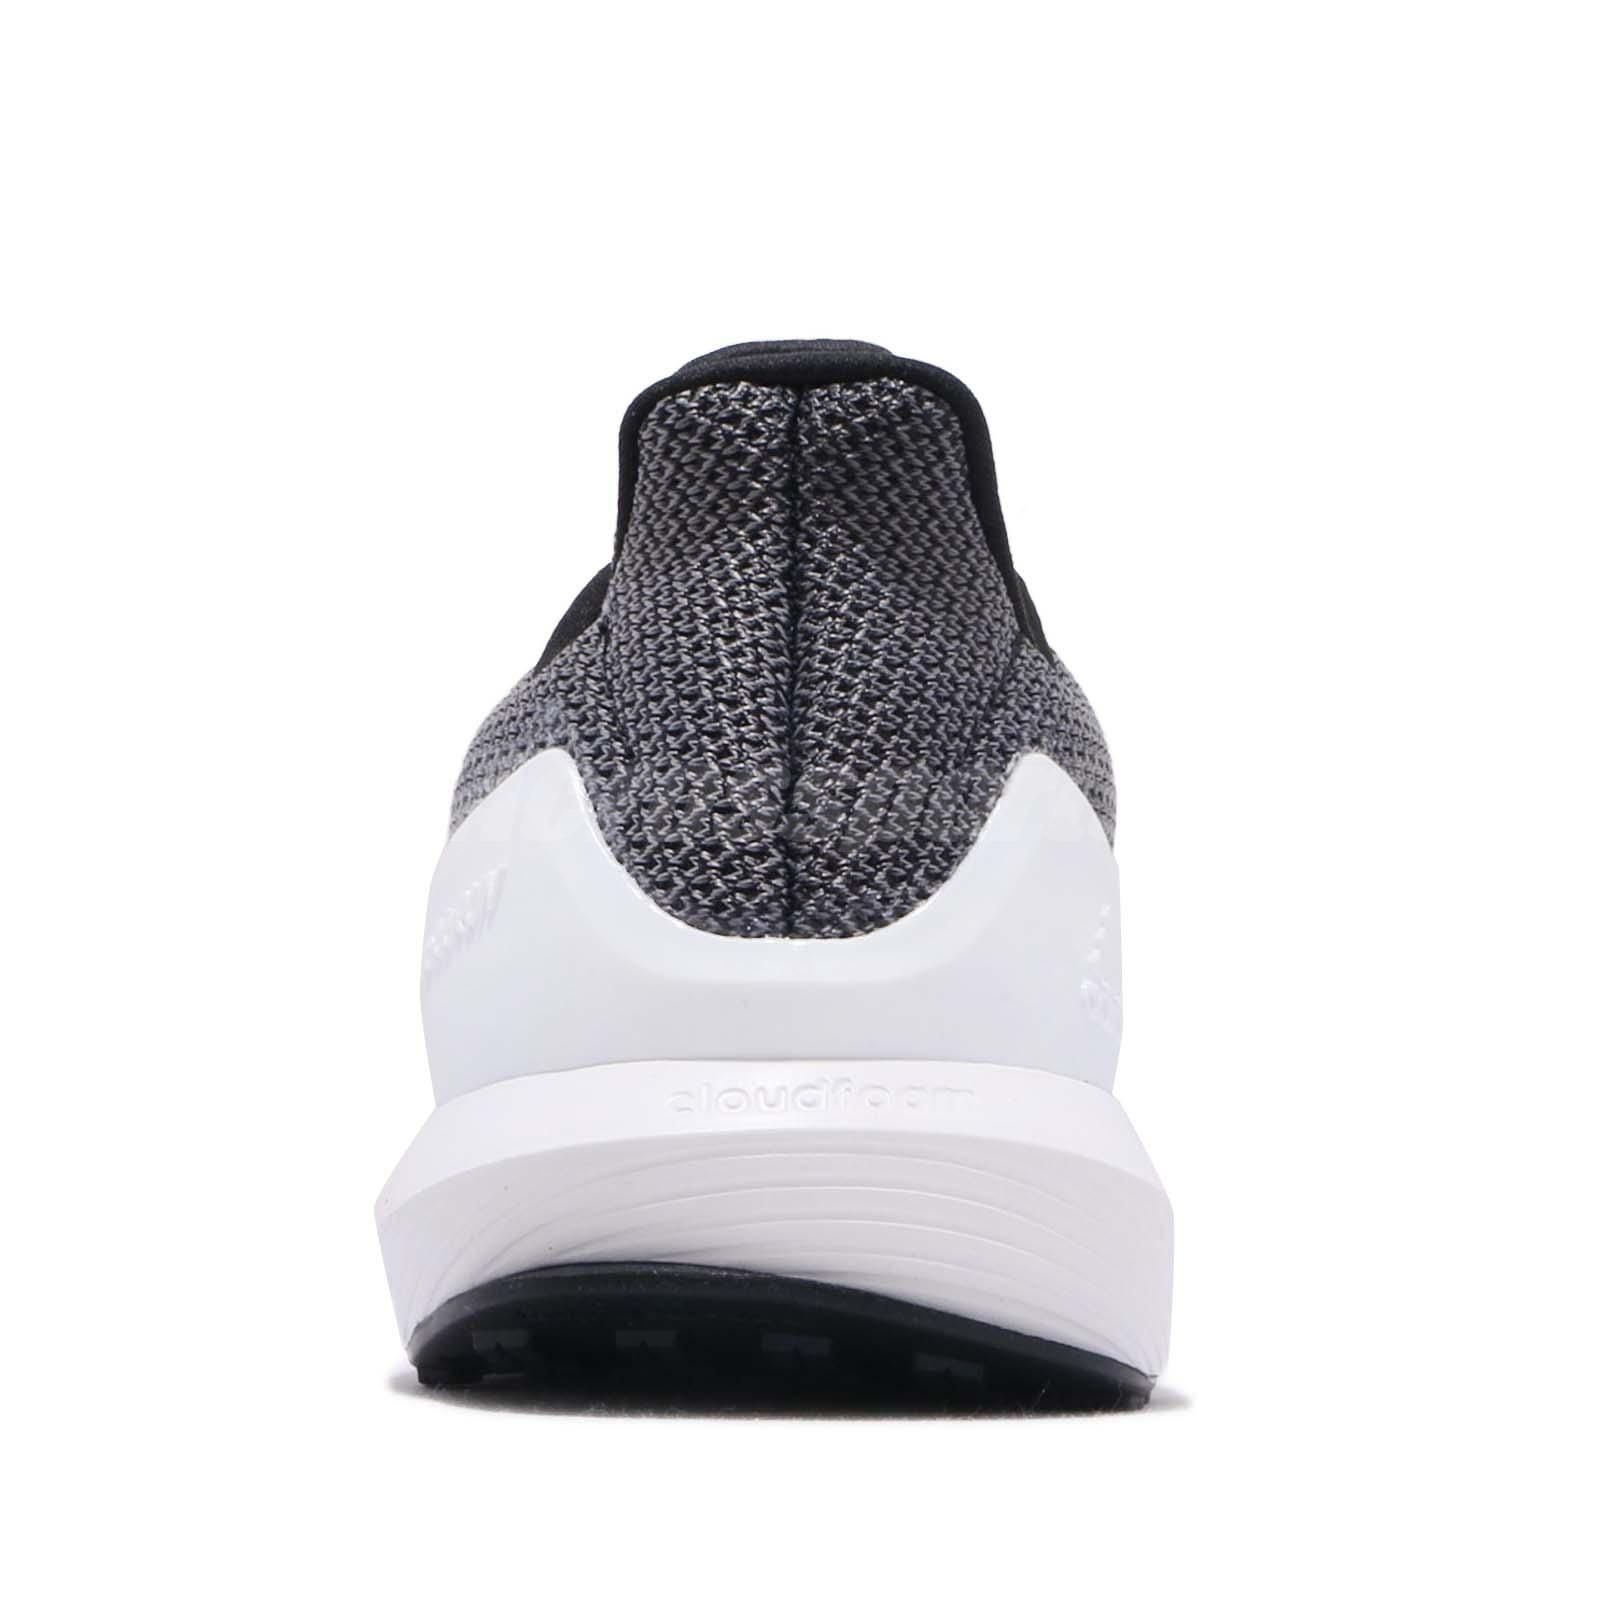 b1563732b adidas RapidaRun K Black Grey White Kid Preschool Running Shoes ...